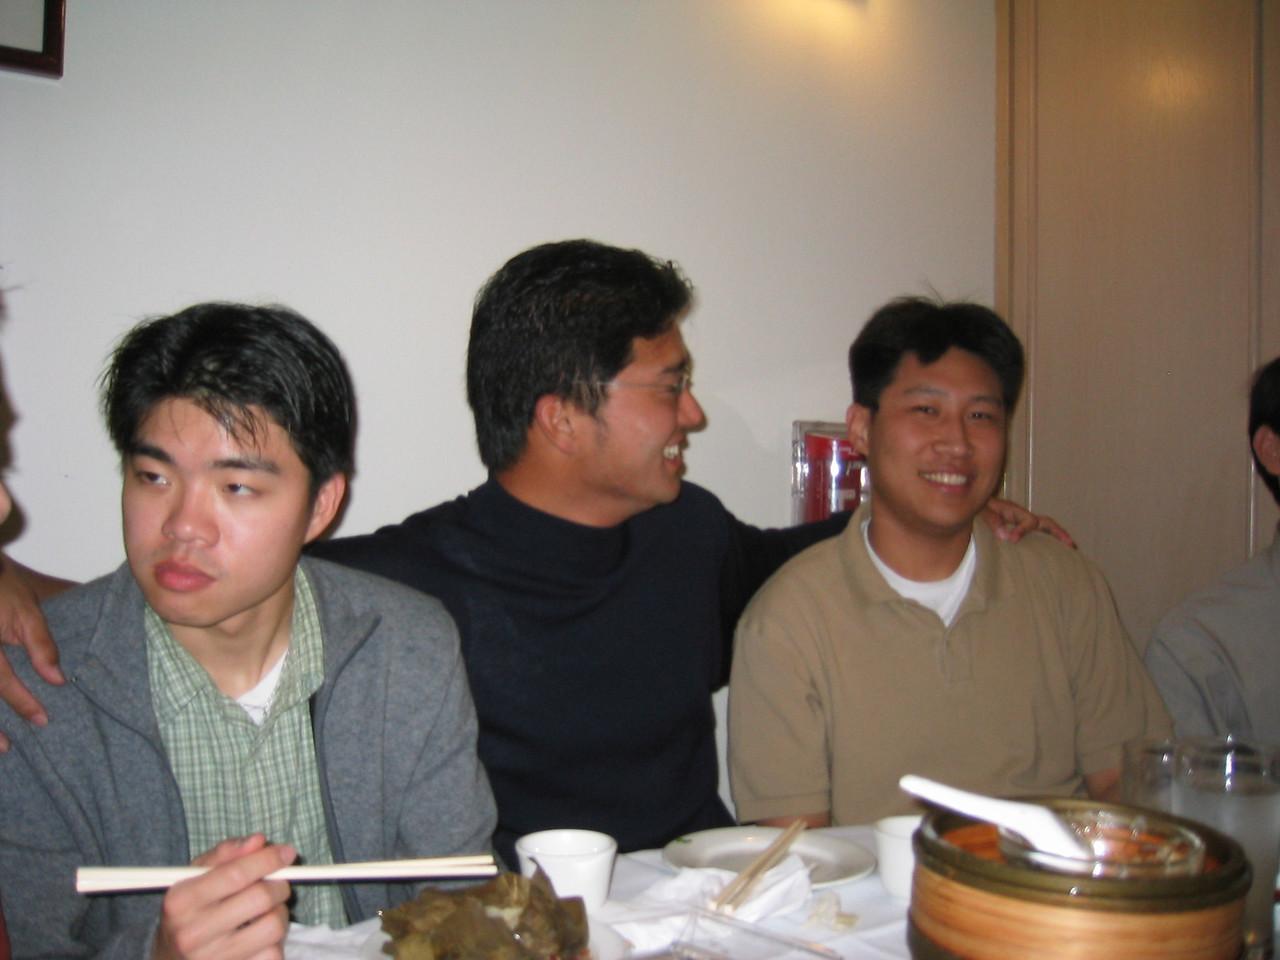 Dave's buddies, Andy Chang & Luke